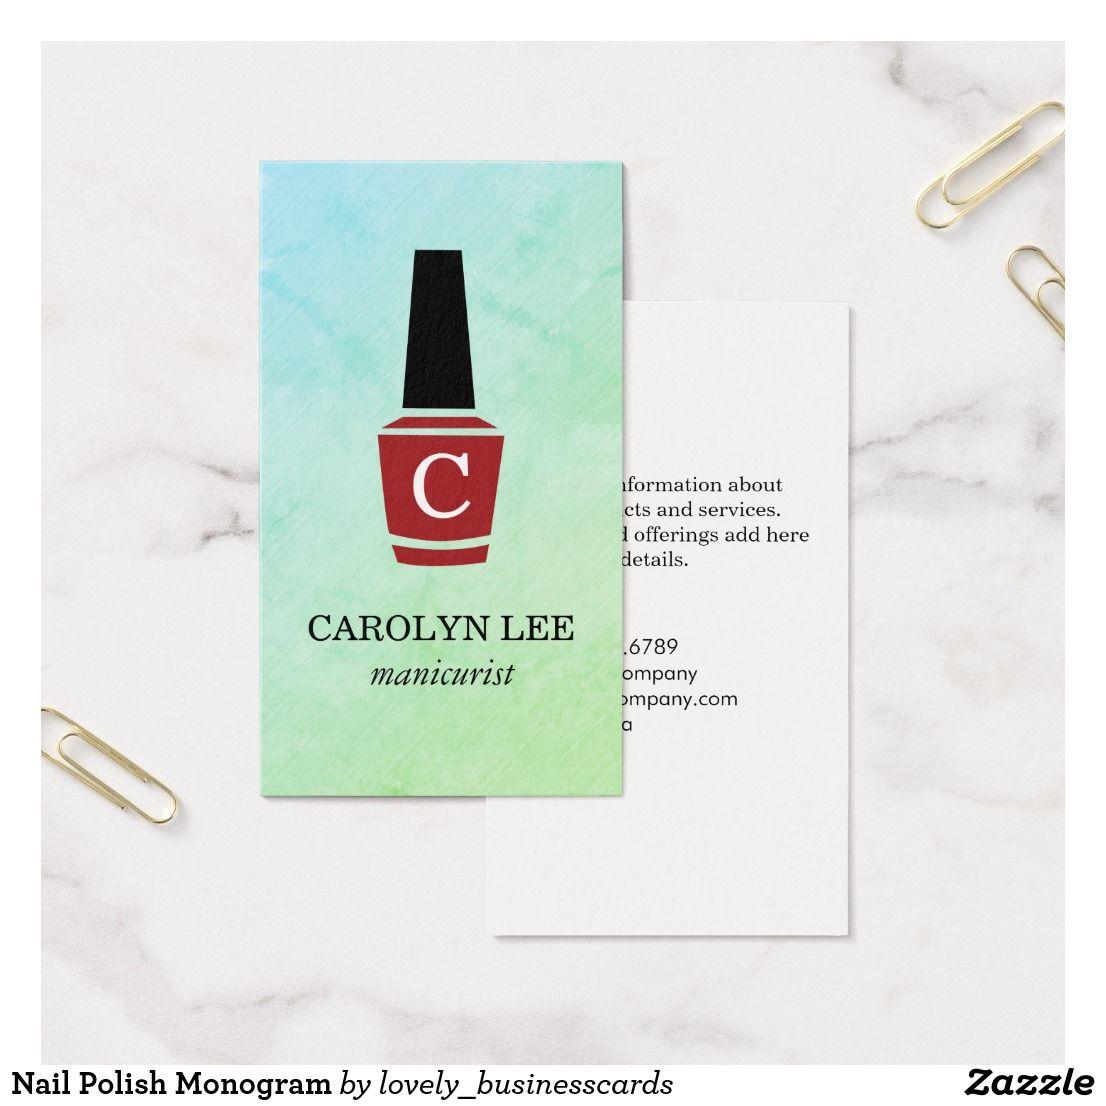 Nail polish monogram business card business cards monograms and nail polish monogram business card magicingreecefo Images